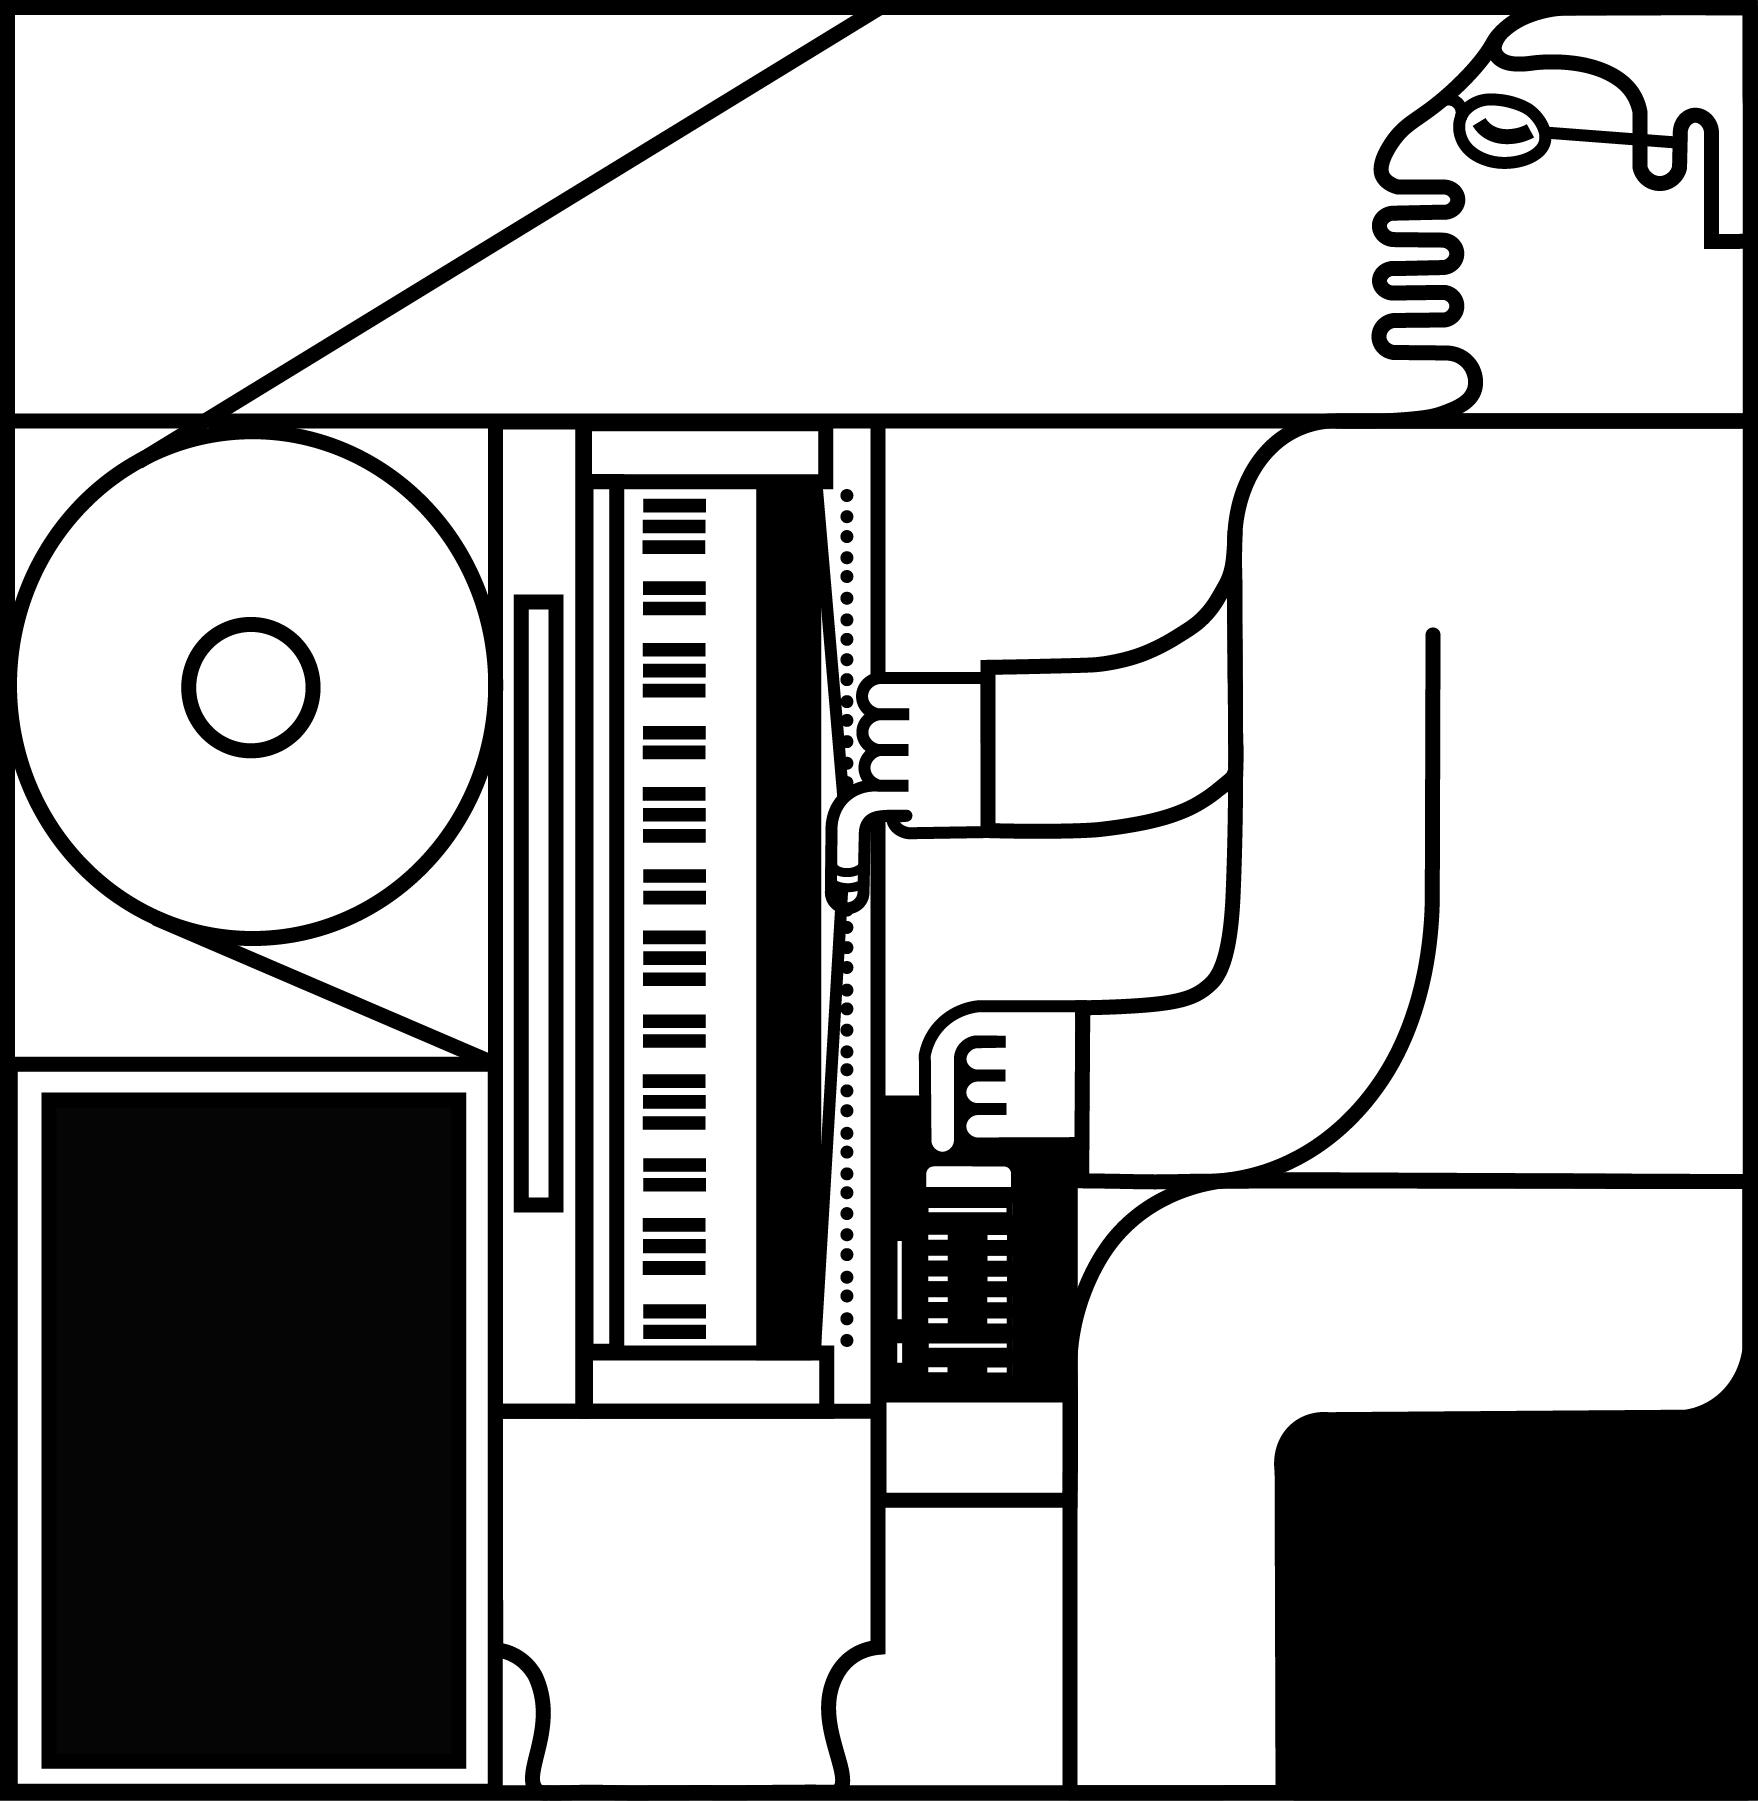 Josh Semans / ondes Martenot (illustration by F. Devine, 2018)